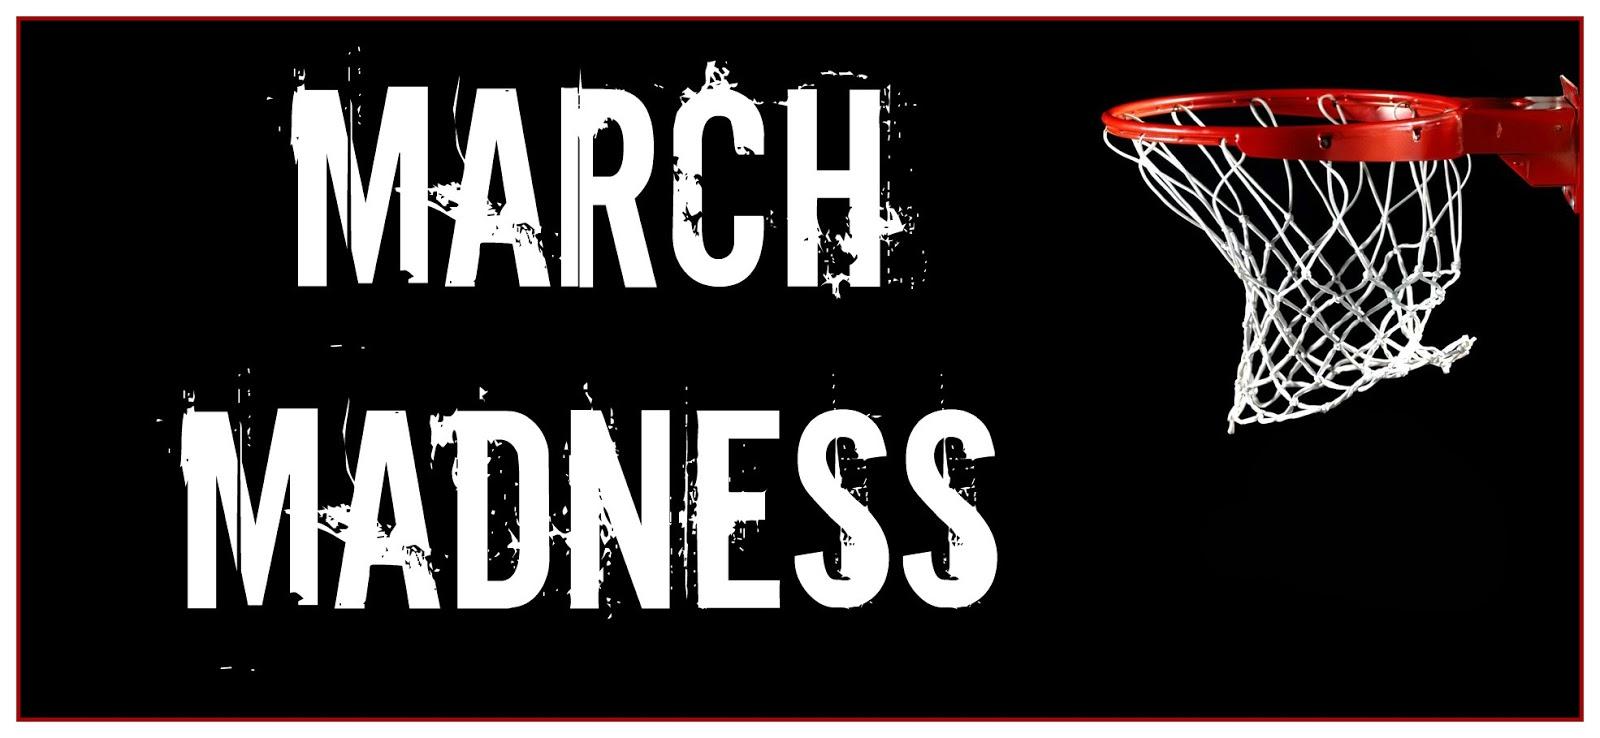 March Madness 1600738 130747 HD Wallpaper Res 1600x738 DesktopAS 1600x738